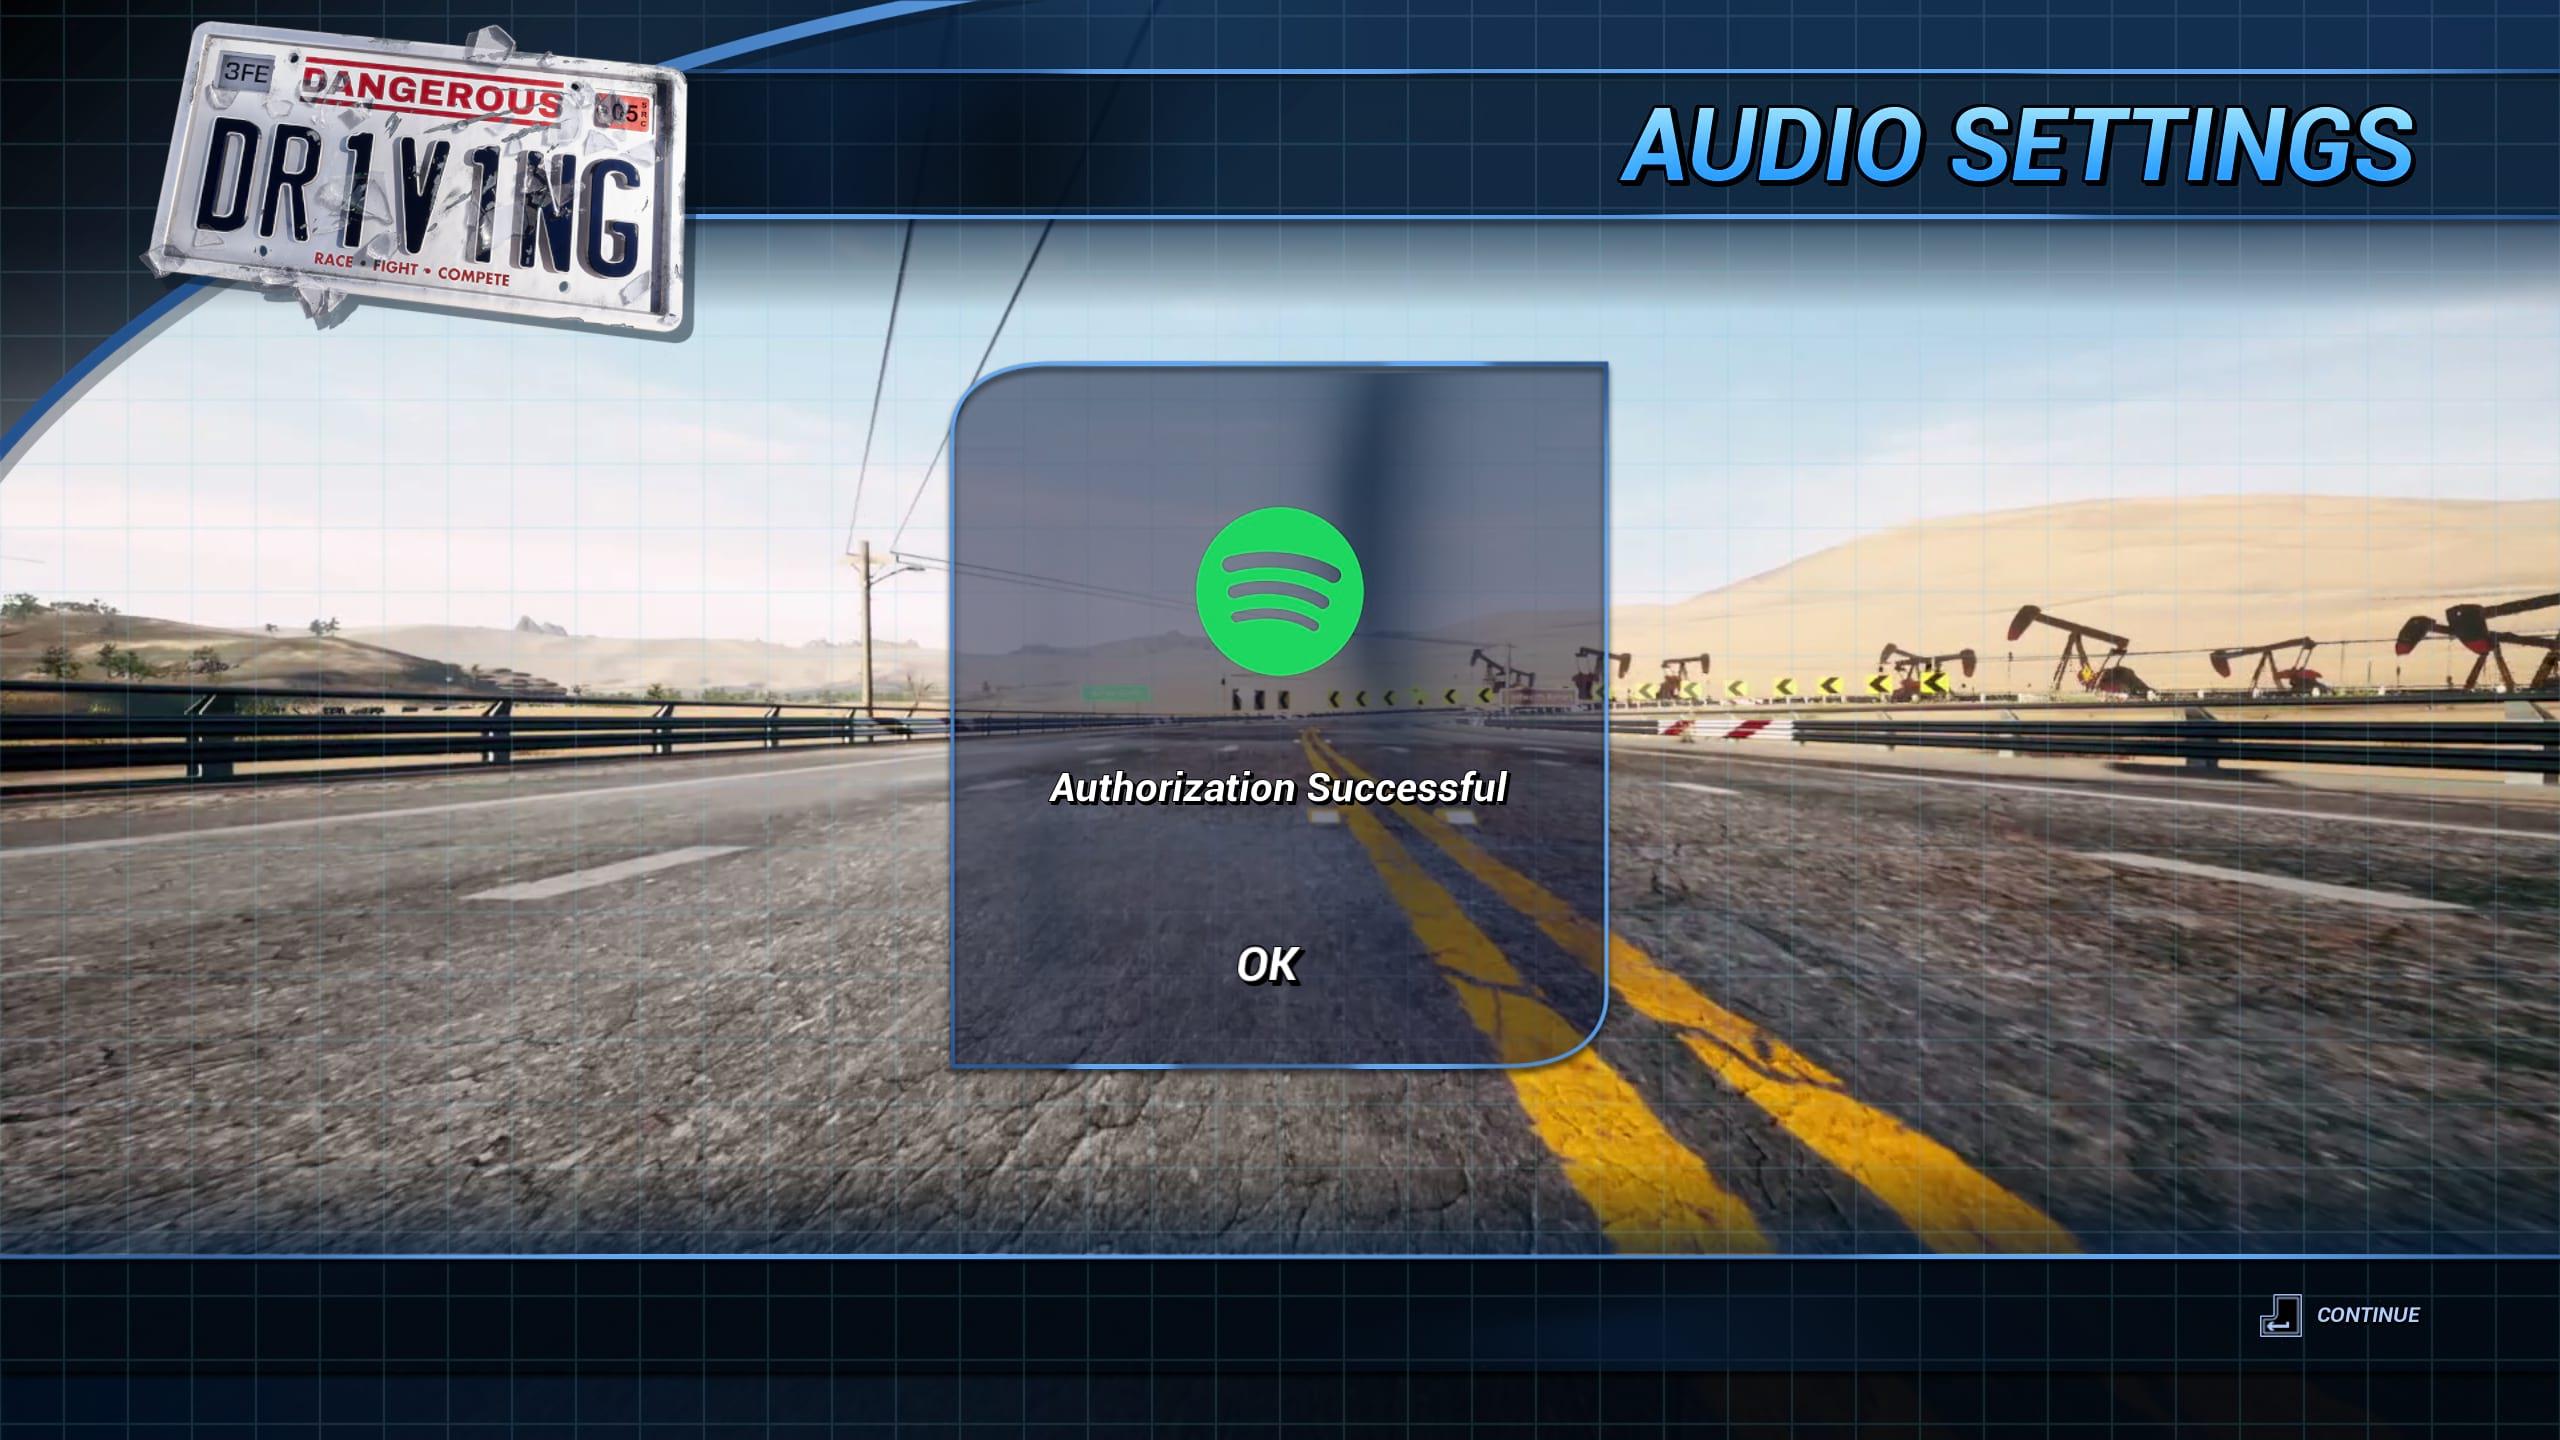 Dangerous Driving Spotify - Three Fields Entertainment